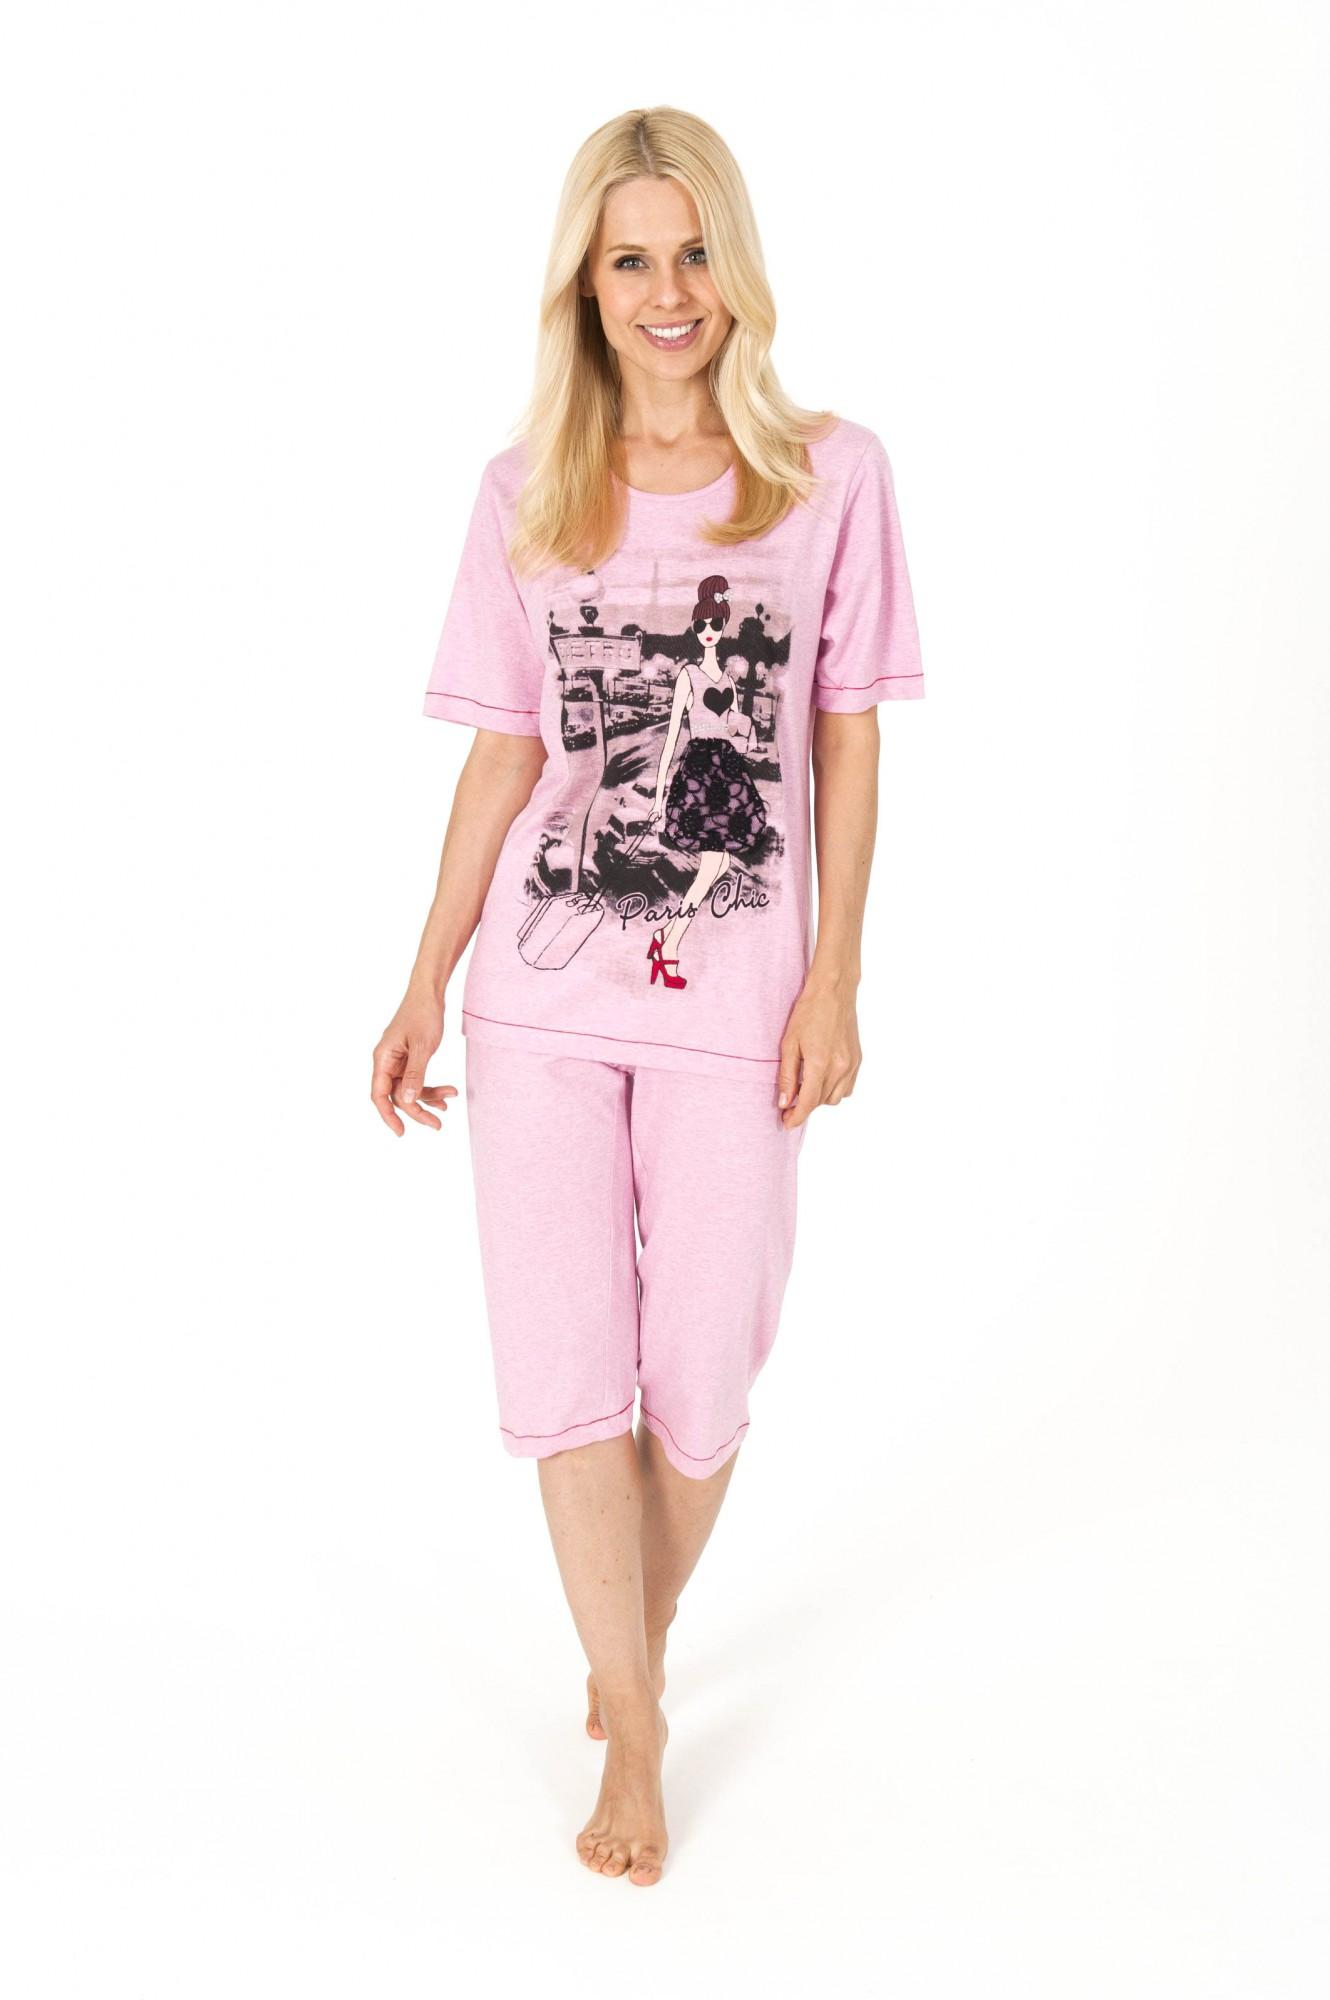 Zauberhafter Damen Capri-Pyjama aus 100 % Baumwolle, 161 204 90 900